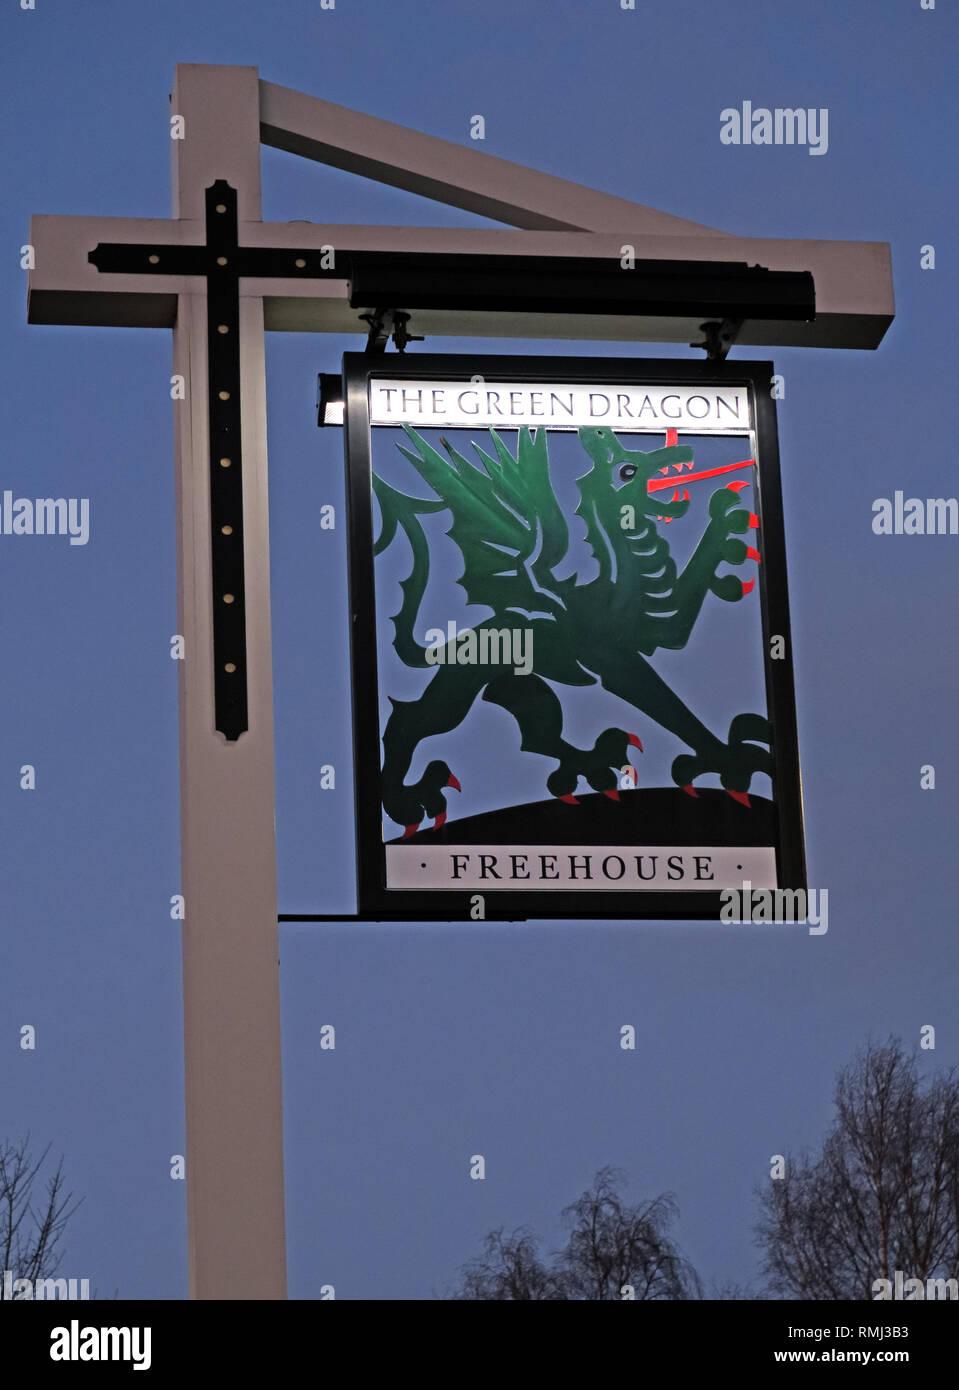 @HotpixUK,HotpixUK,GoTonySmith,England,UK,Green Dragon,pub,bar,sign,pub sign,The Green Dragon,freehouse,Lymm,green,dragon,Wales,Public House,CAMRA,J. R. R. Tolkiens Middle-earth writings,J. R. R. Tolkiens,JRR,Middle-earth,writings,Tolkien,Middleearth,Tolkiens,Middle earth,Vintage Inn,Vintage Inns,2 Mill Lane,Cheshire,WA13 9SB,WA13,alehouse